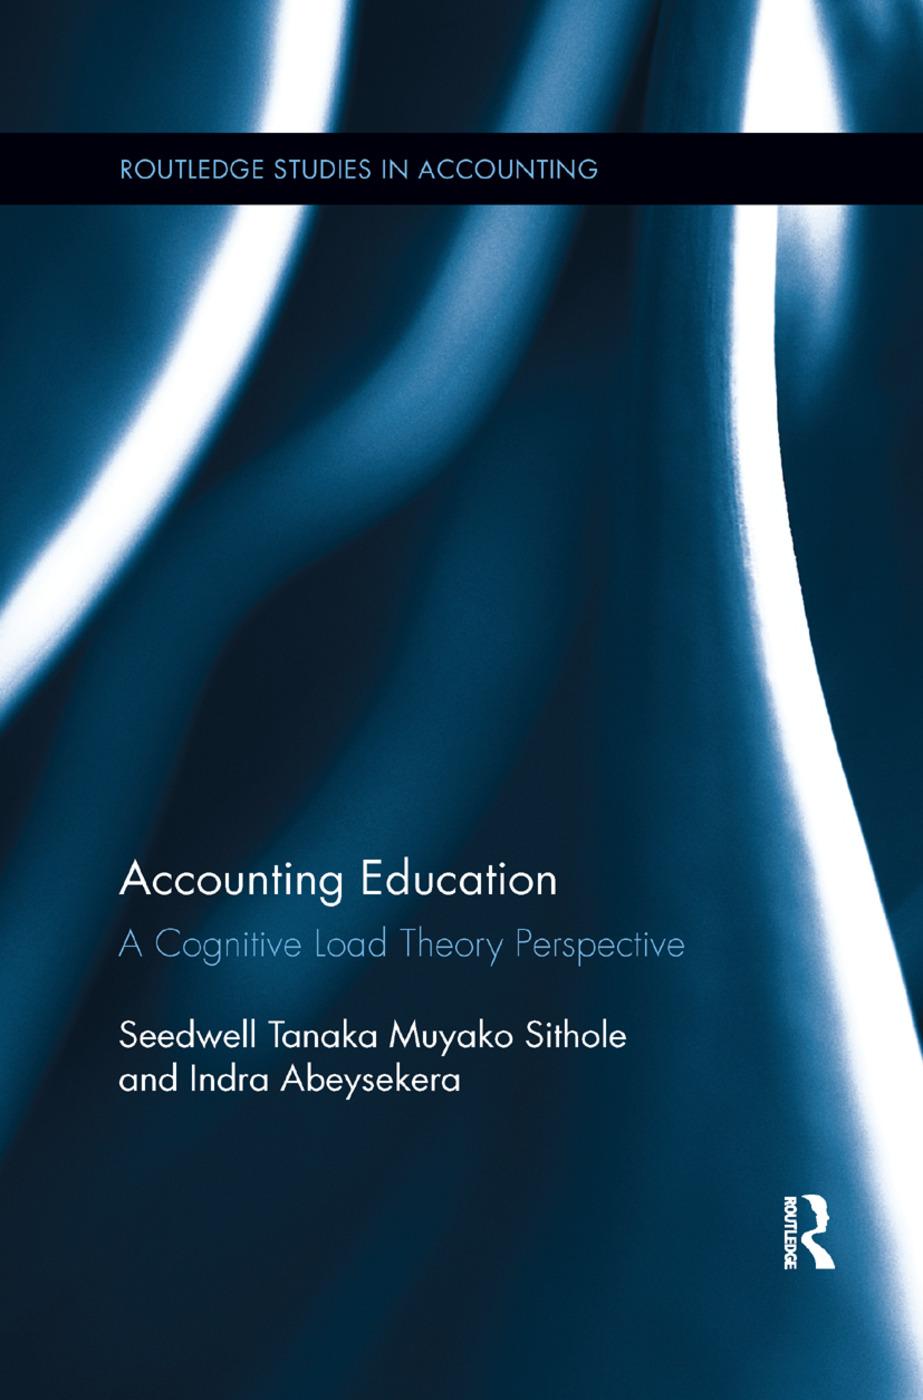 Accounting Education